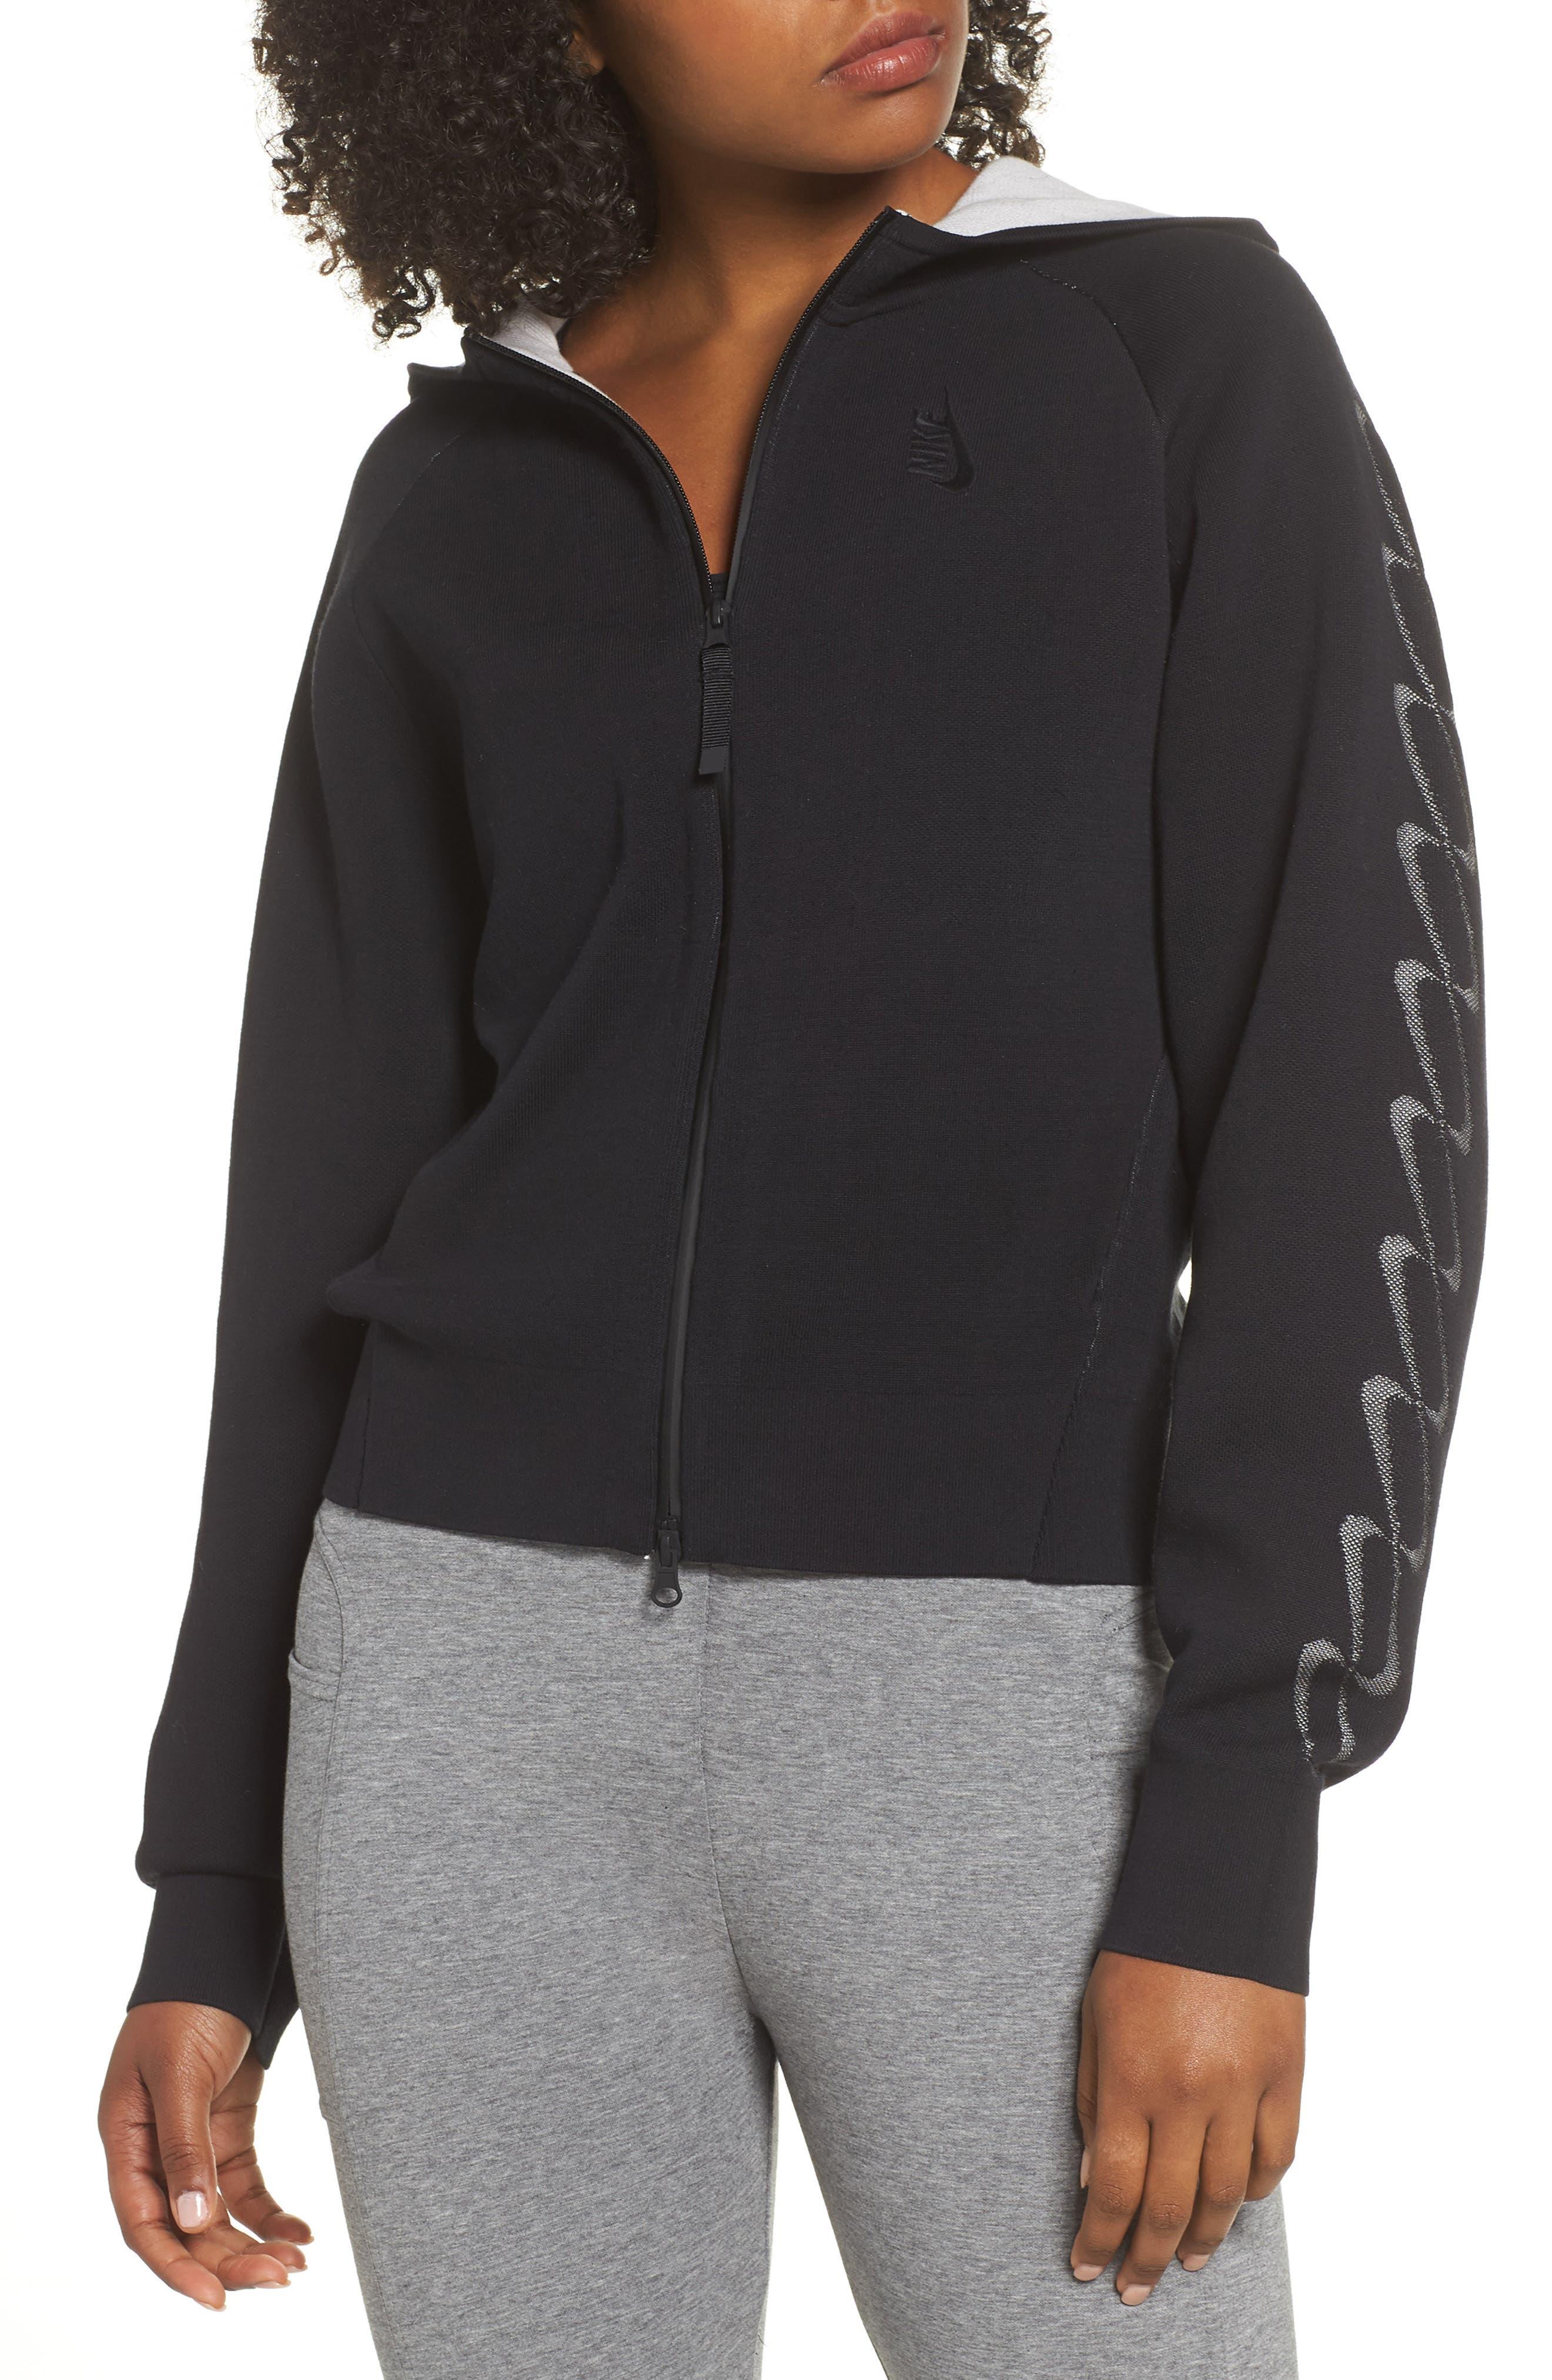 NRG Women's Knit Jacket,                             Main thumbnail 1, color,                             Black/ Vast Grey